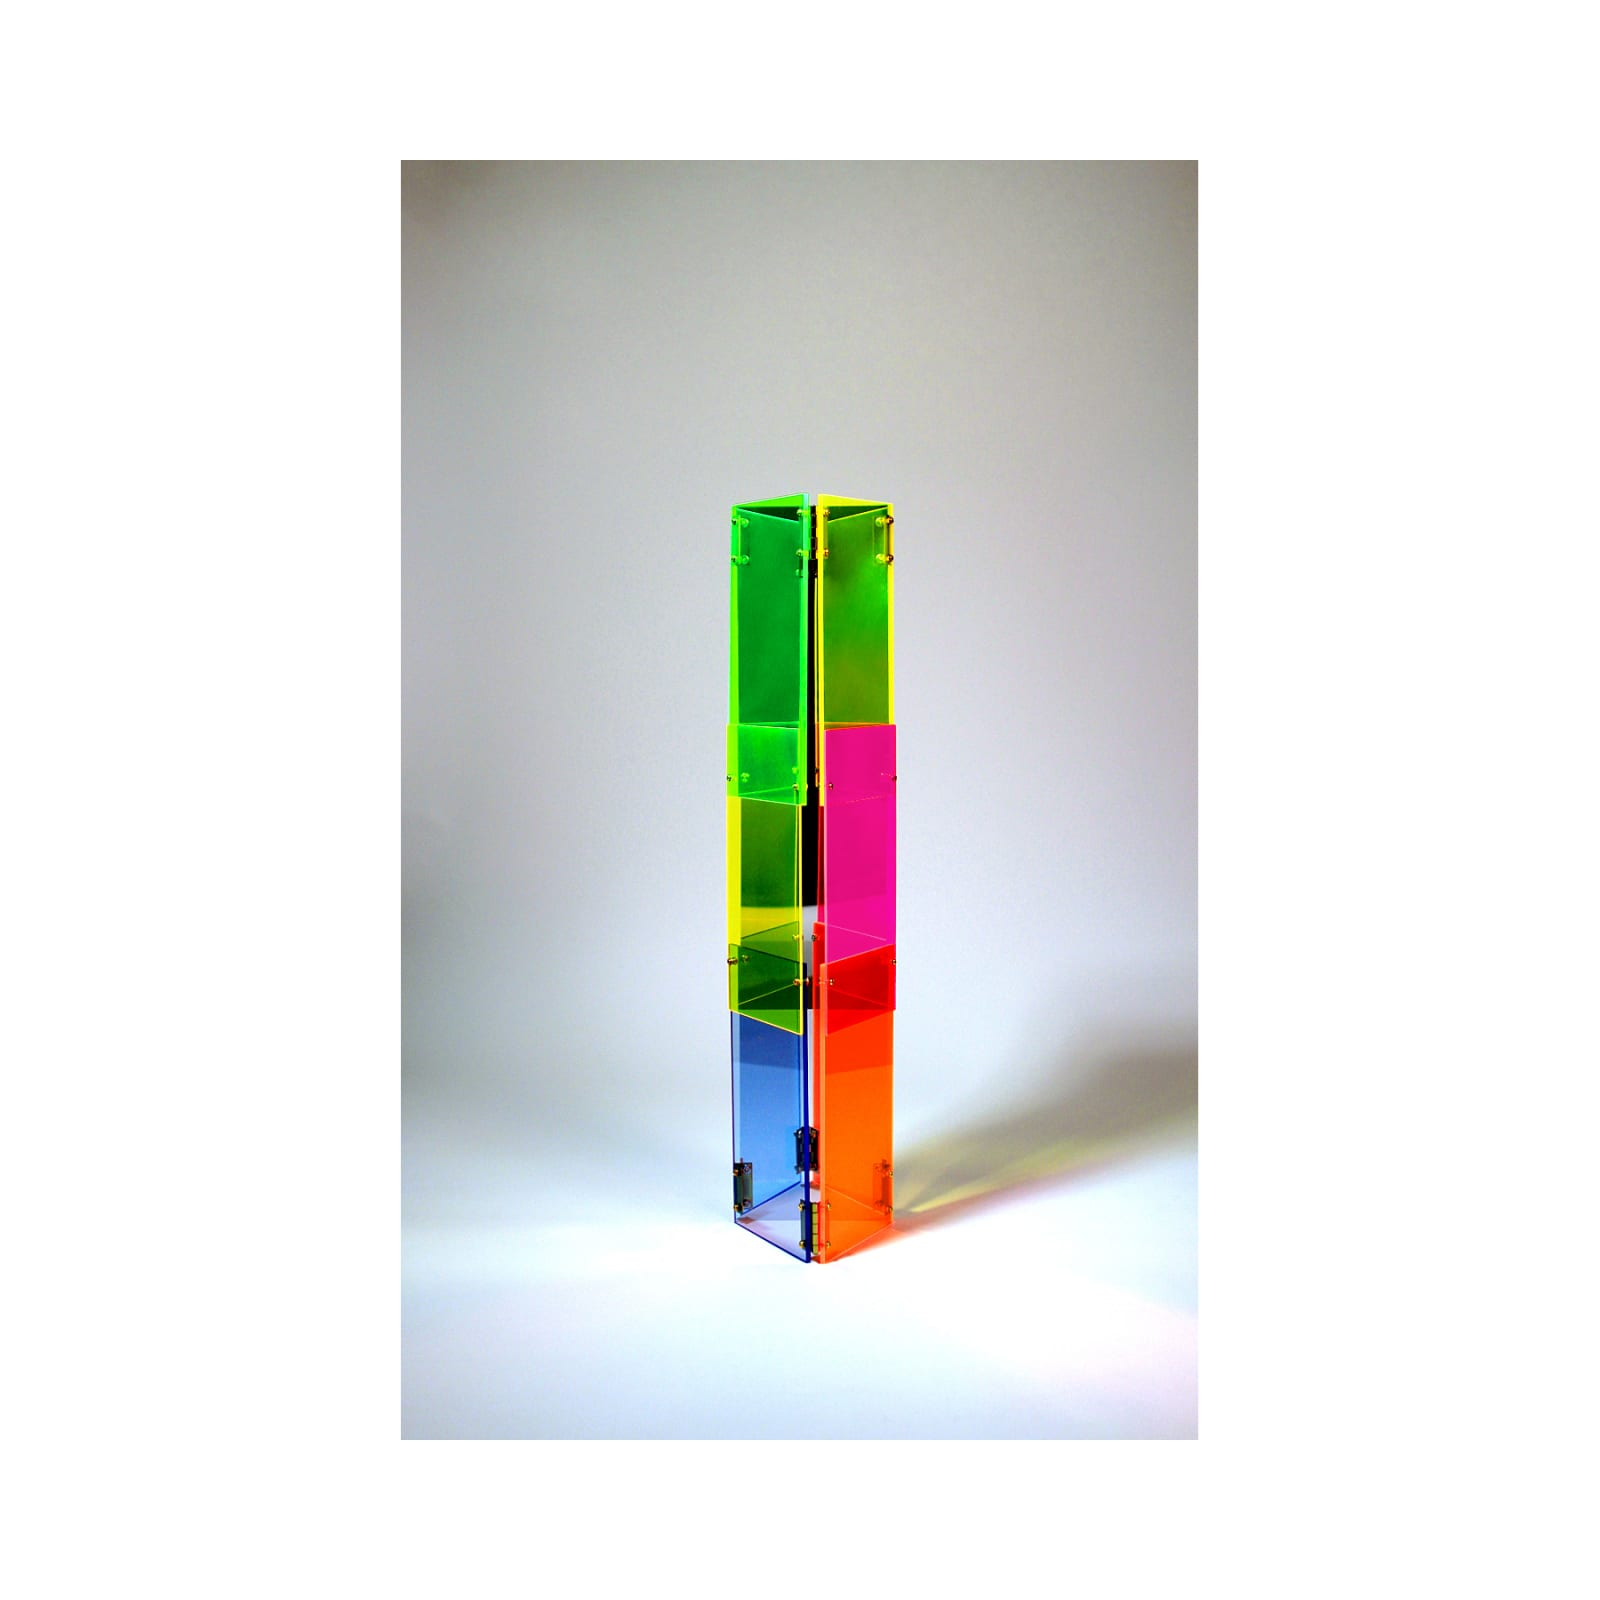 Anne Katrine Senstad  Babel 01, 2020  Lucite/Plexiglas, mirrors, brass door hinges, brass screws, bolts and washers  30 x 7 x 8 in  76.2 x 17.8 x 20.3 cm  Series: Circle of Babel